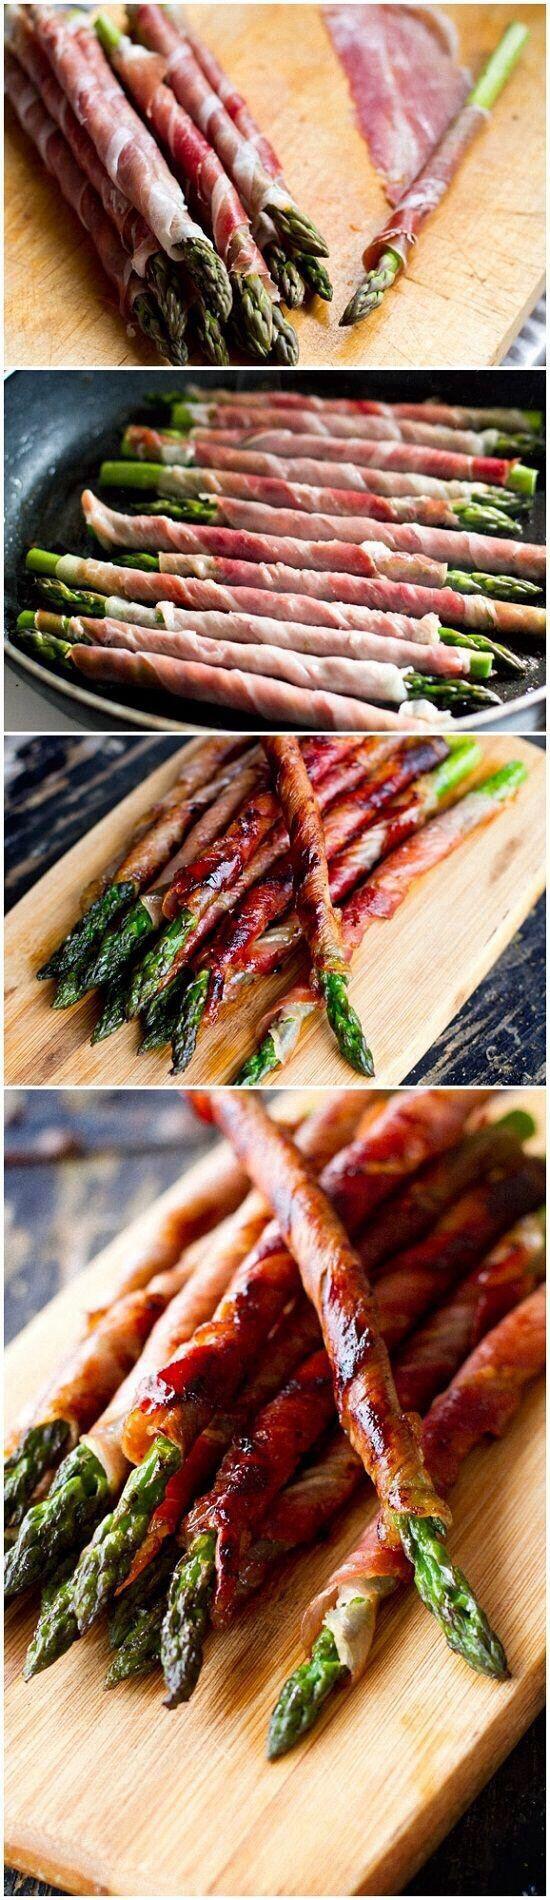 Prosciutto wrapped Asparagus                                                                                                                                                                                 More